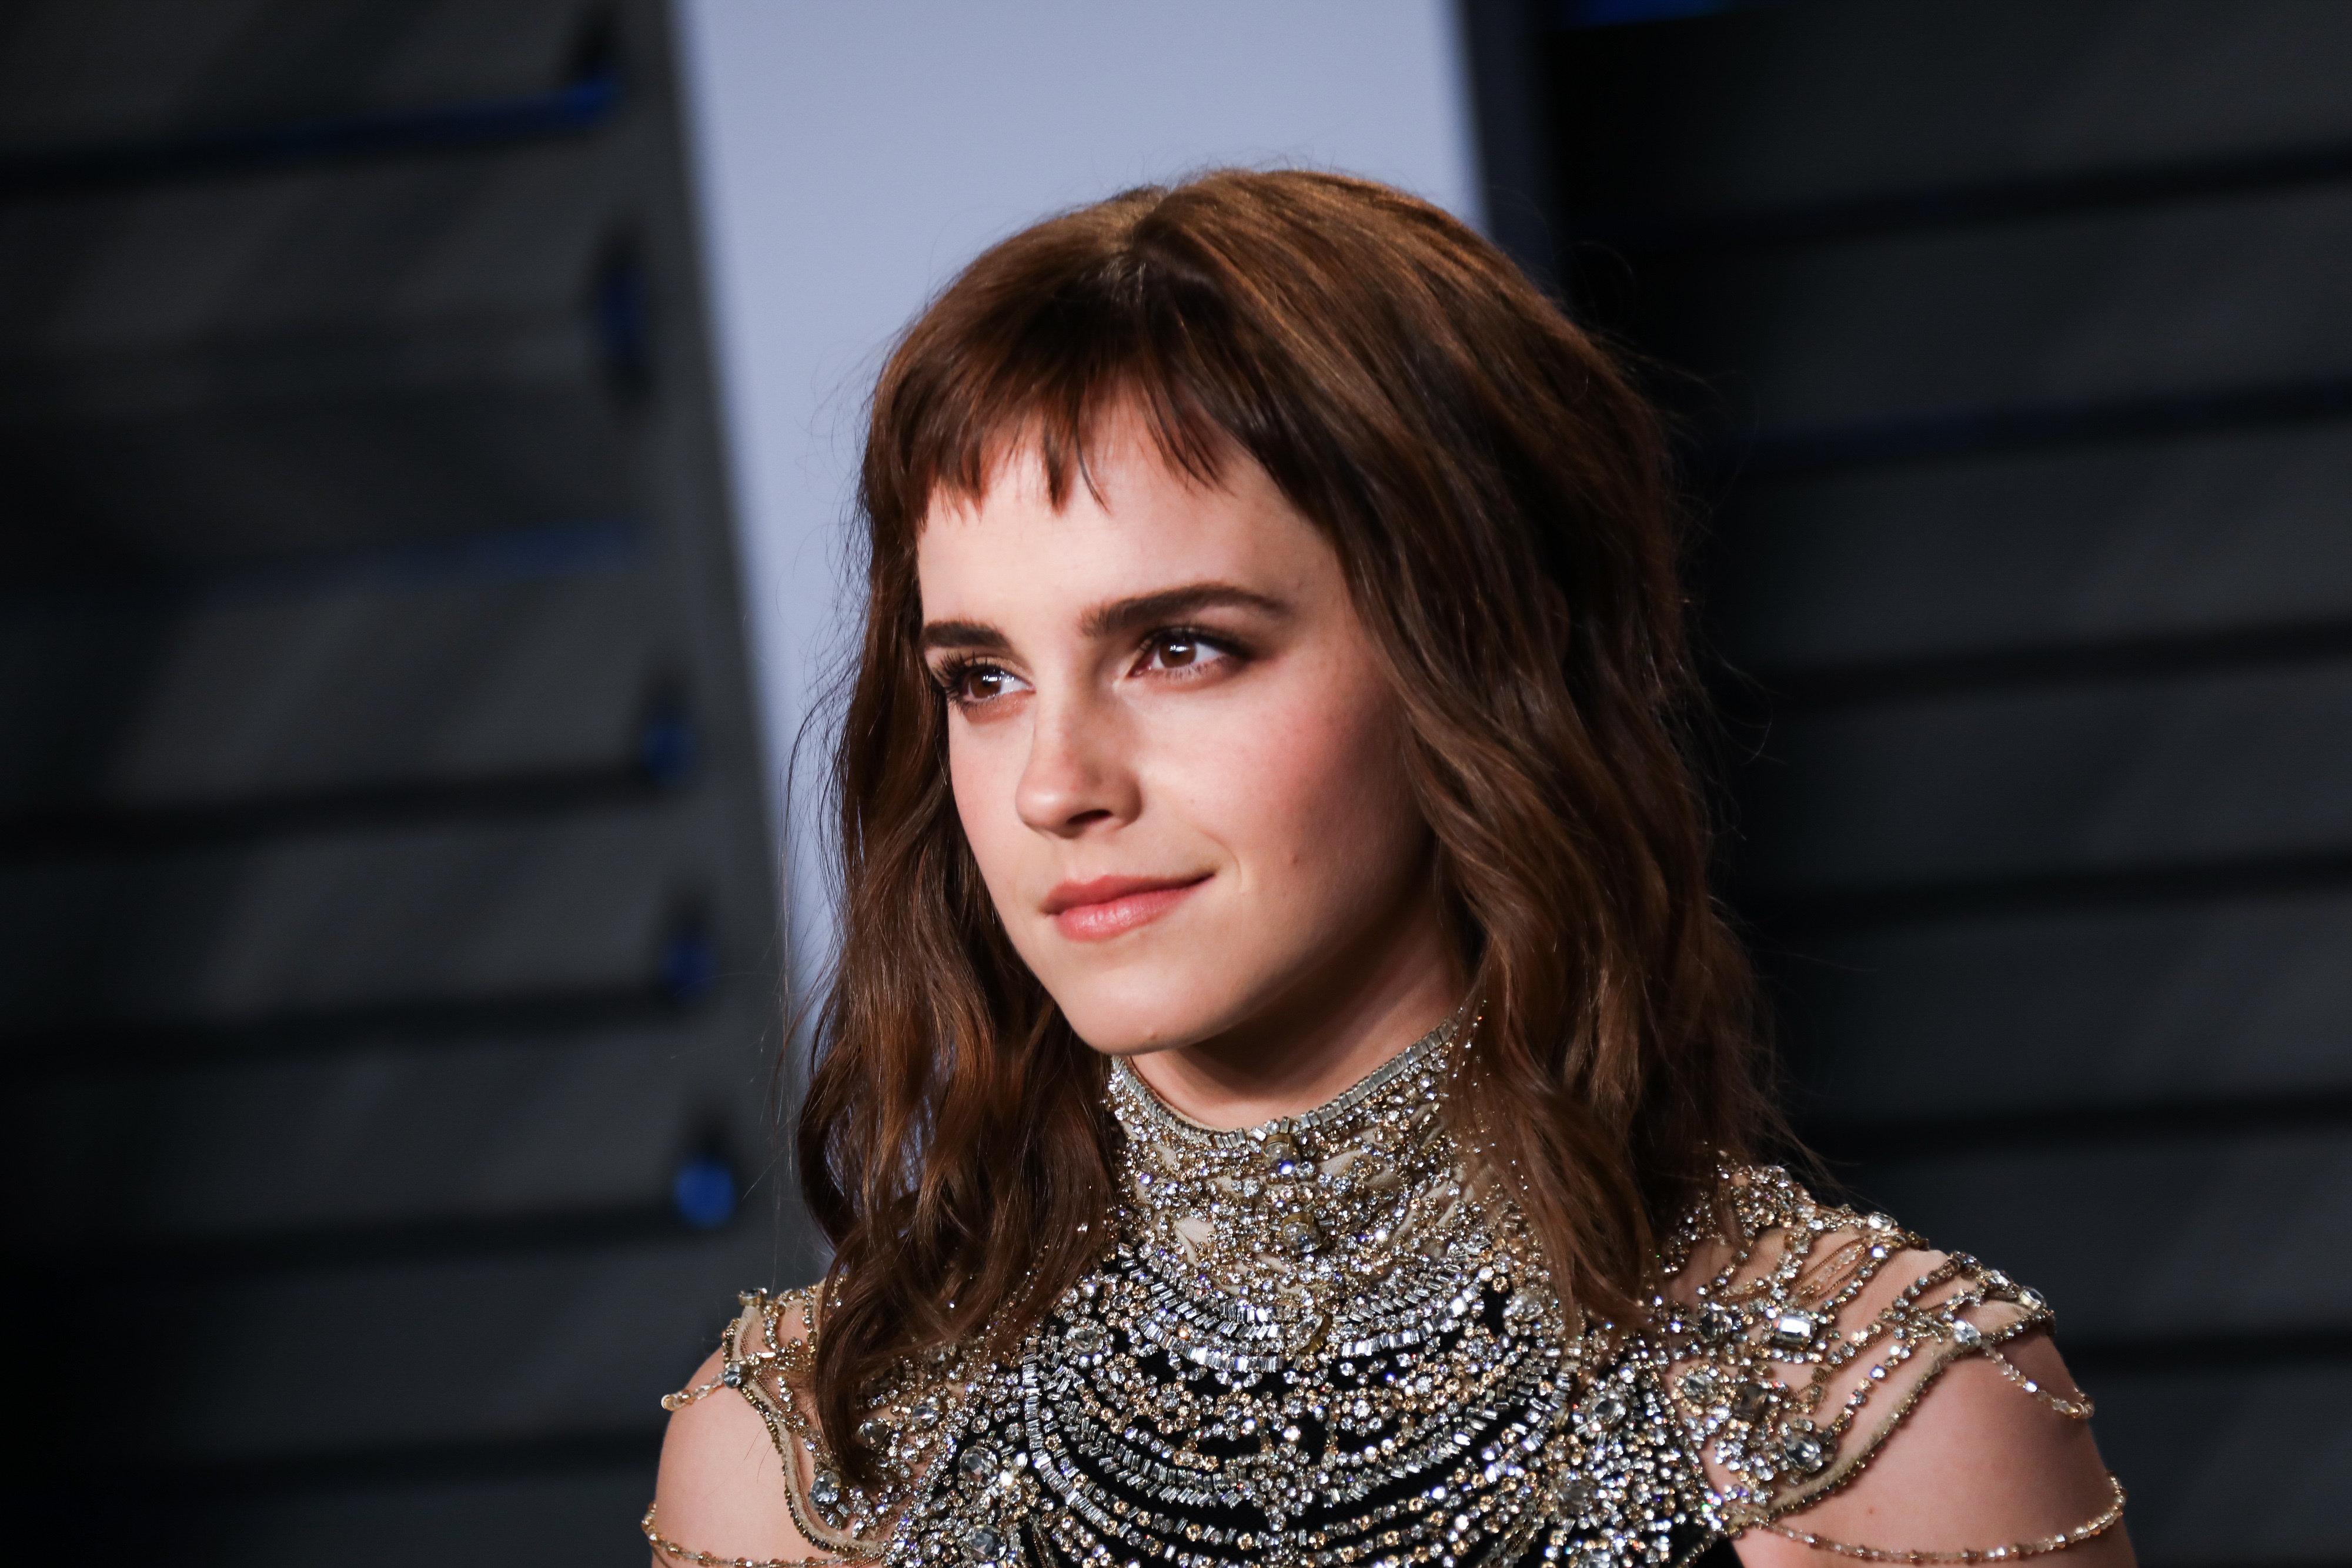 Emma Watson has donated money to the